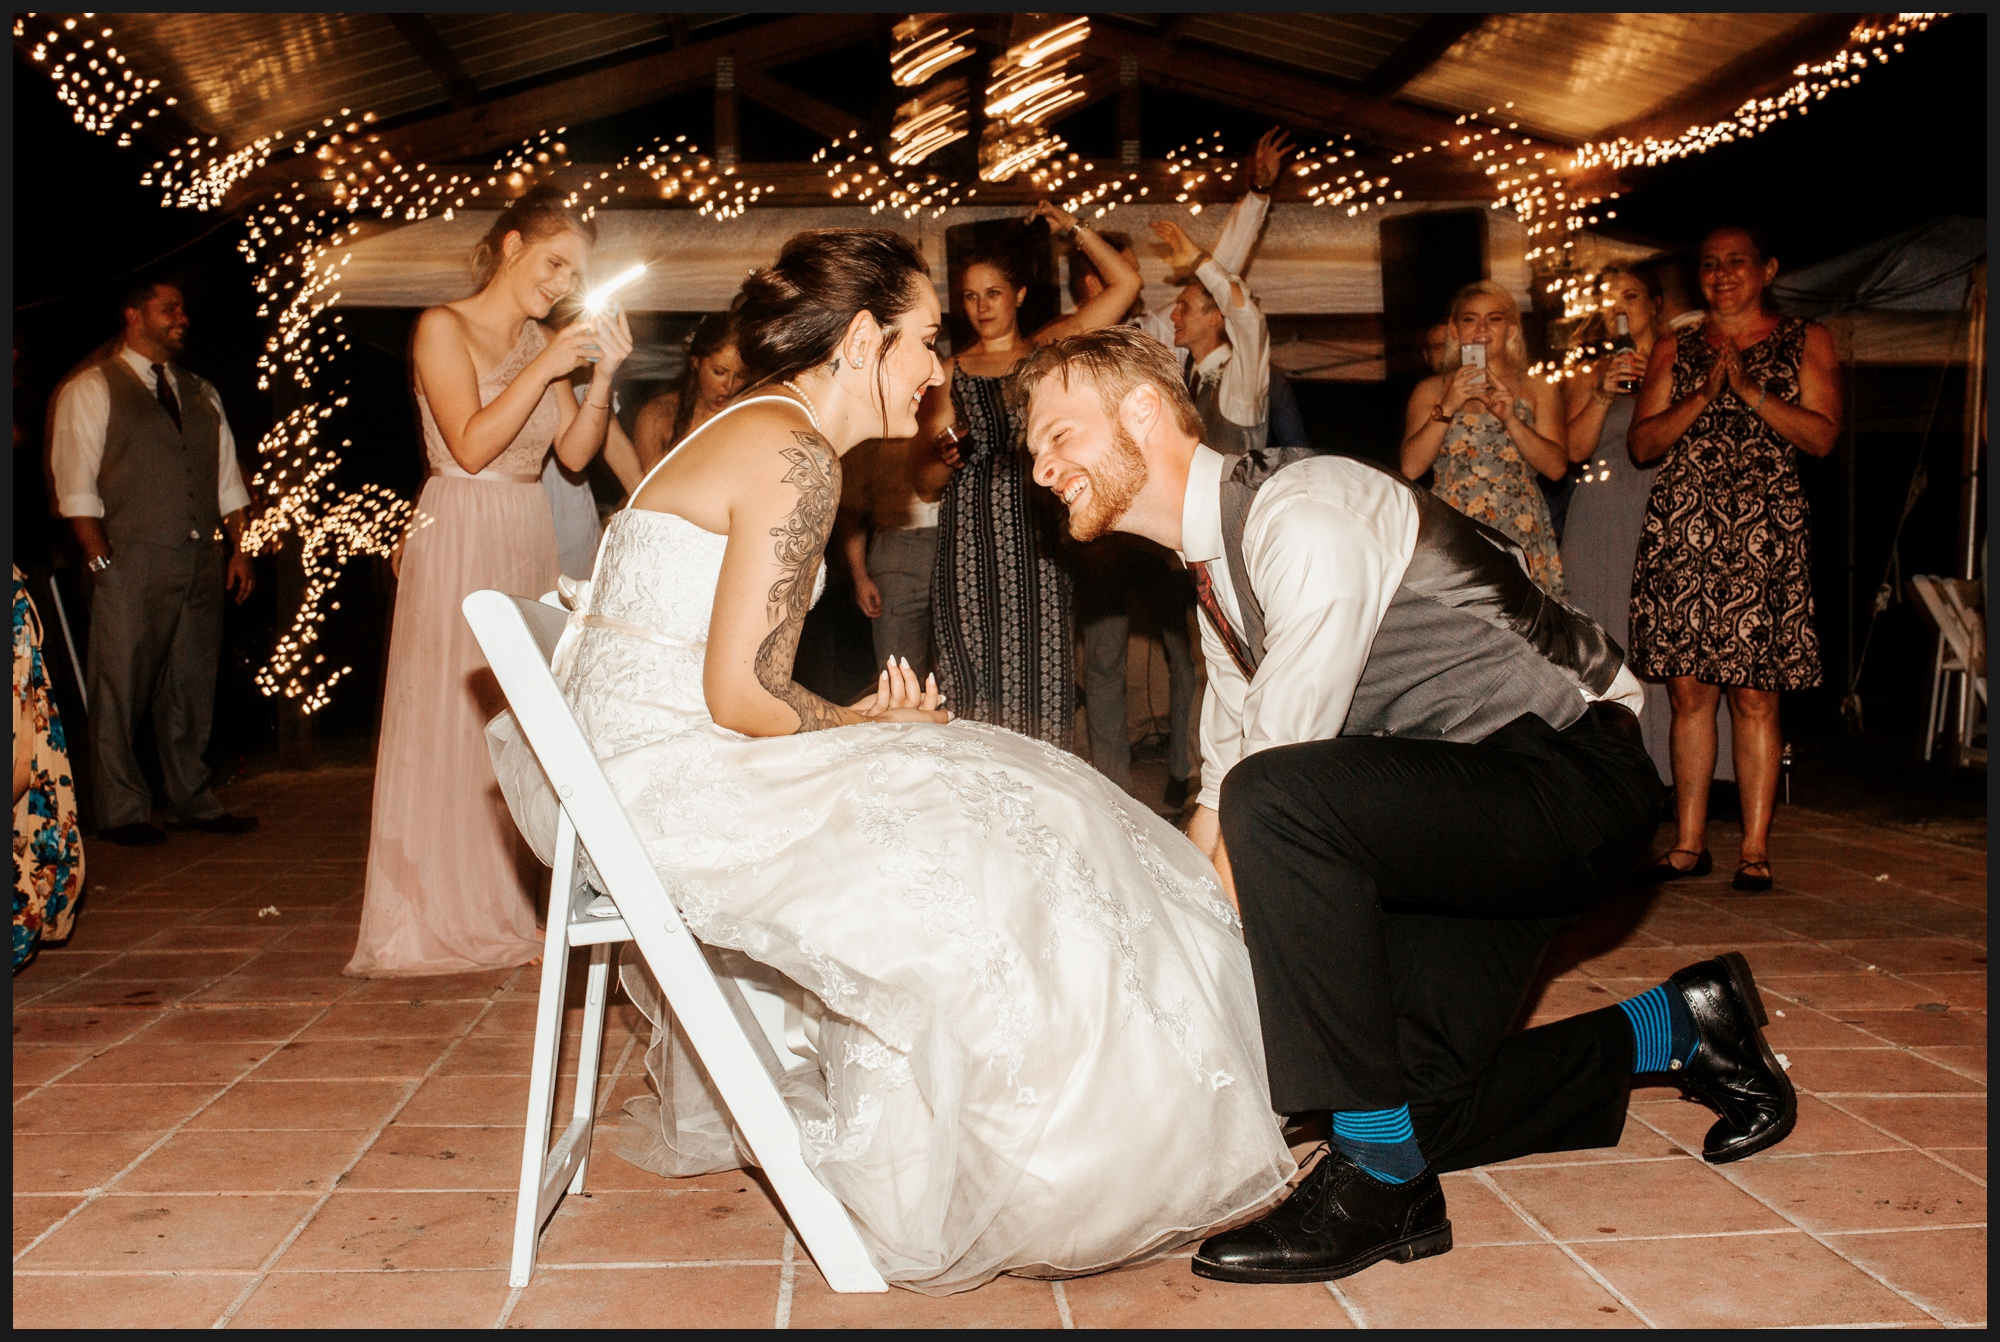 Orlando-Wedding-Photographer-destination-wedding-photographer-florida-wedding-photographer-bohemian-wedding-photographer_0377.jpg